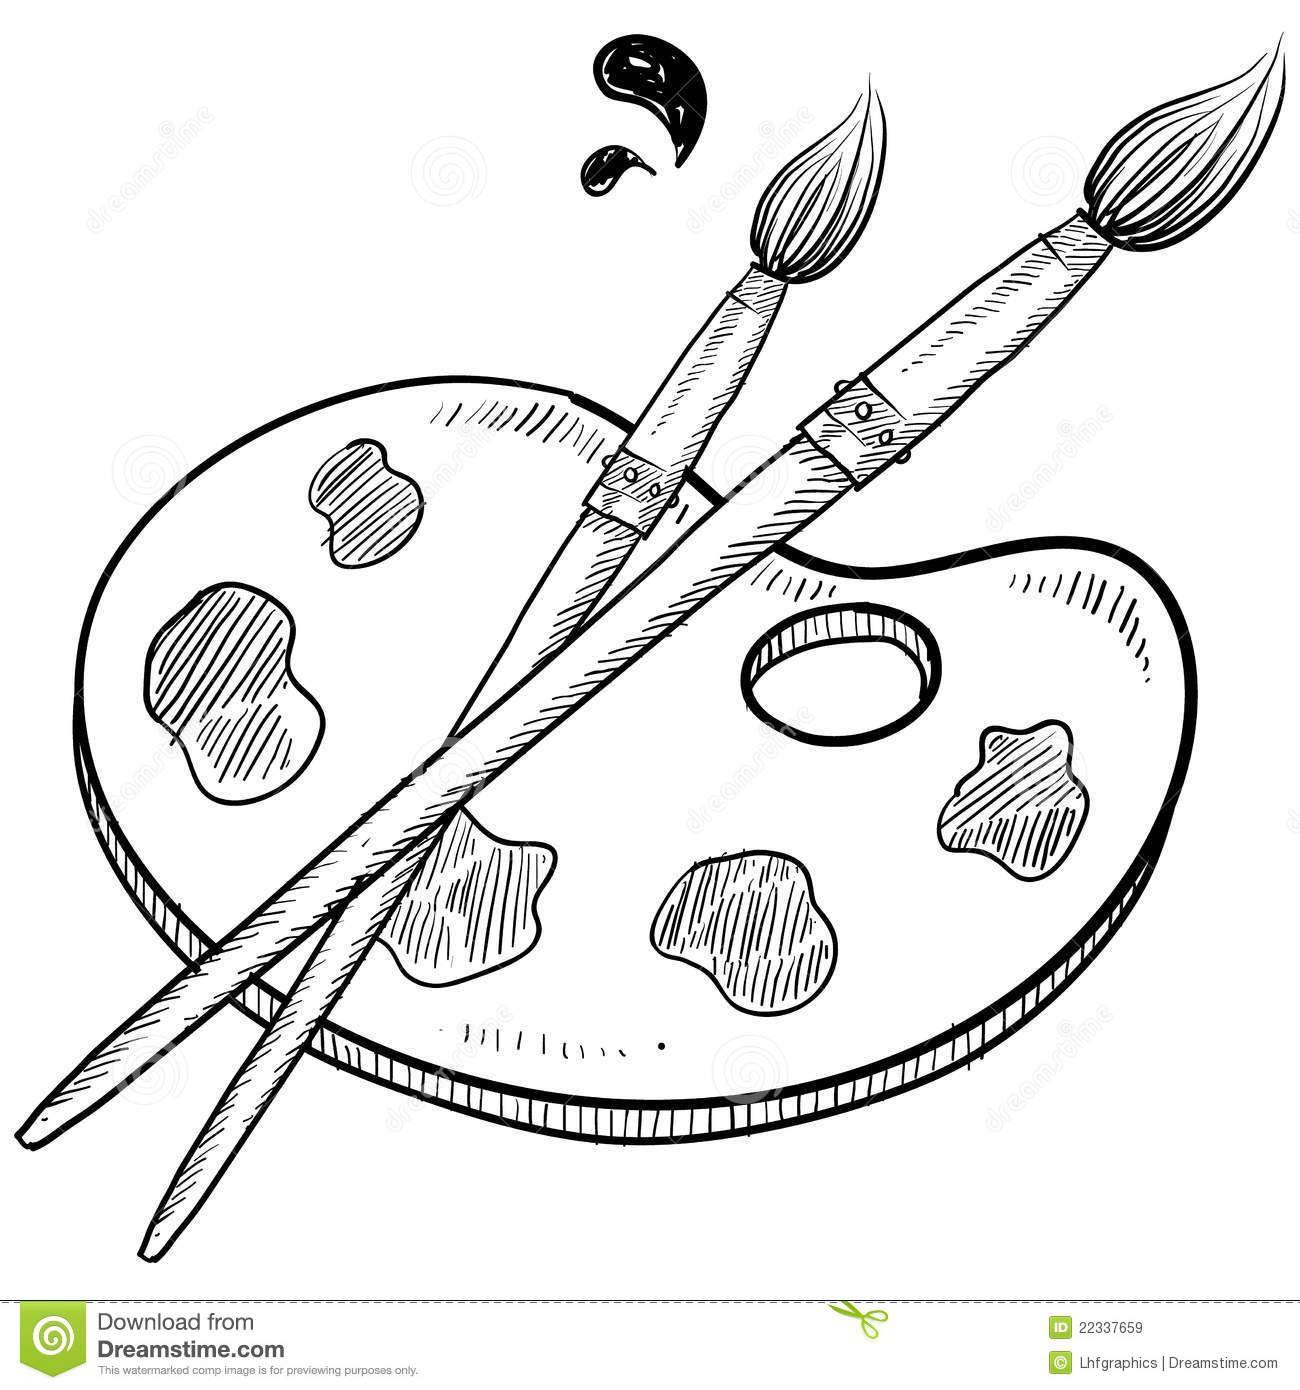 Brush clipart sketch. Paintbrush black and white